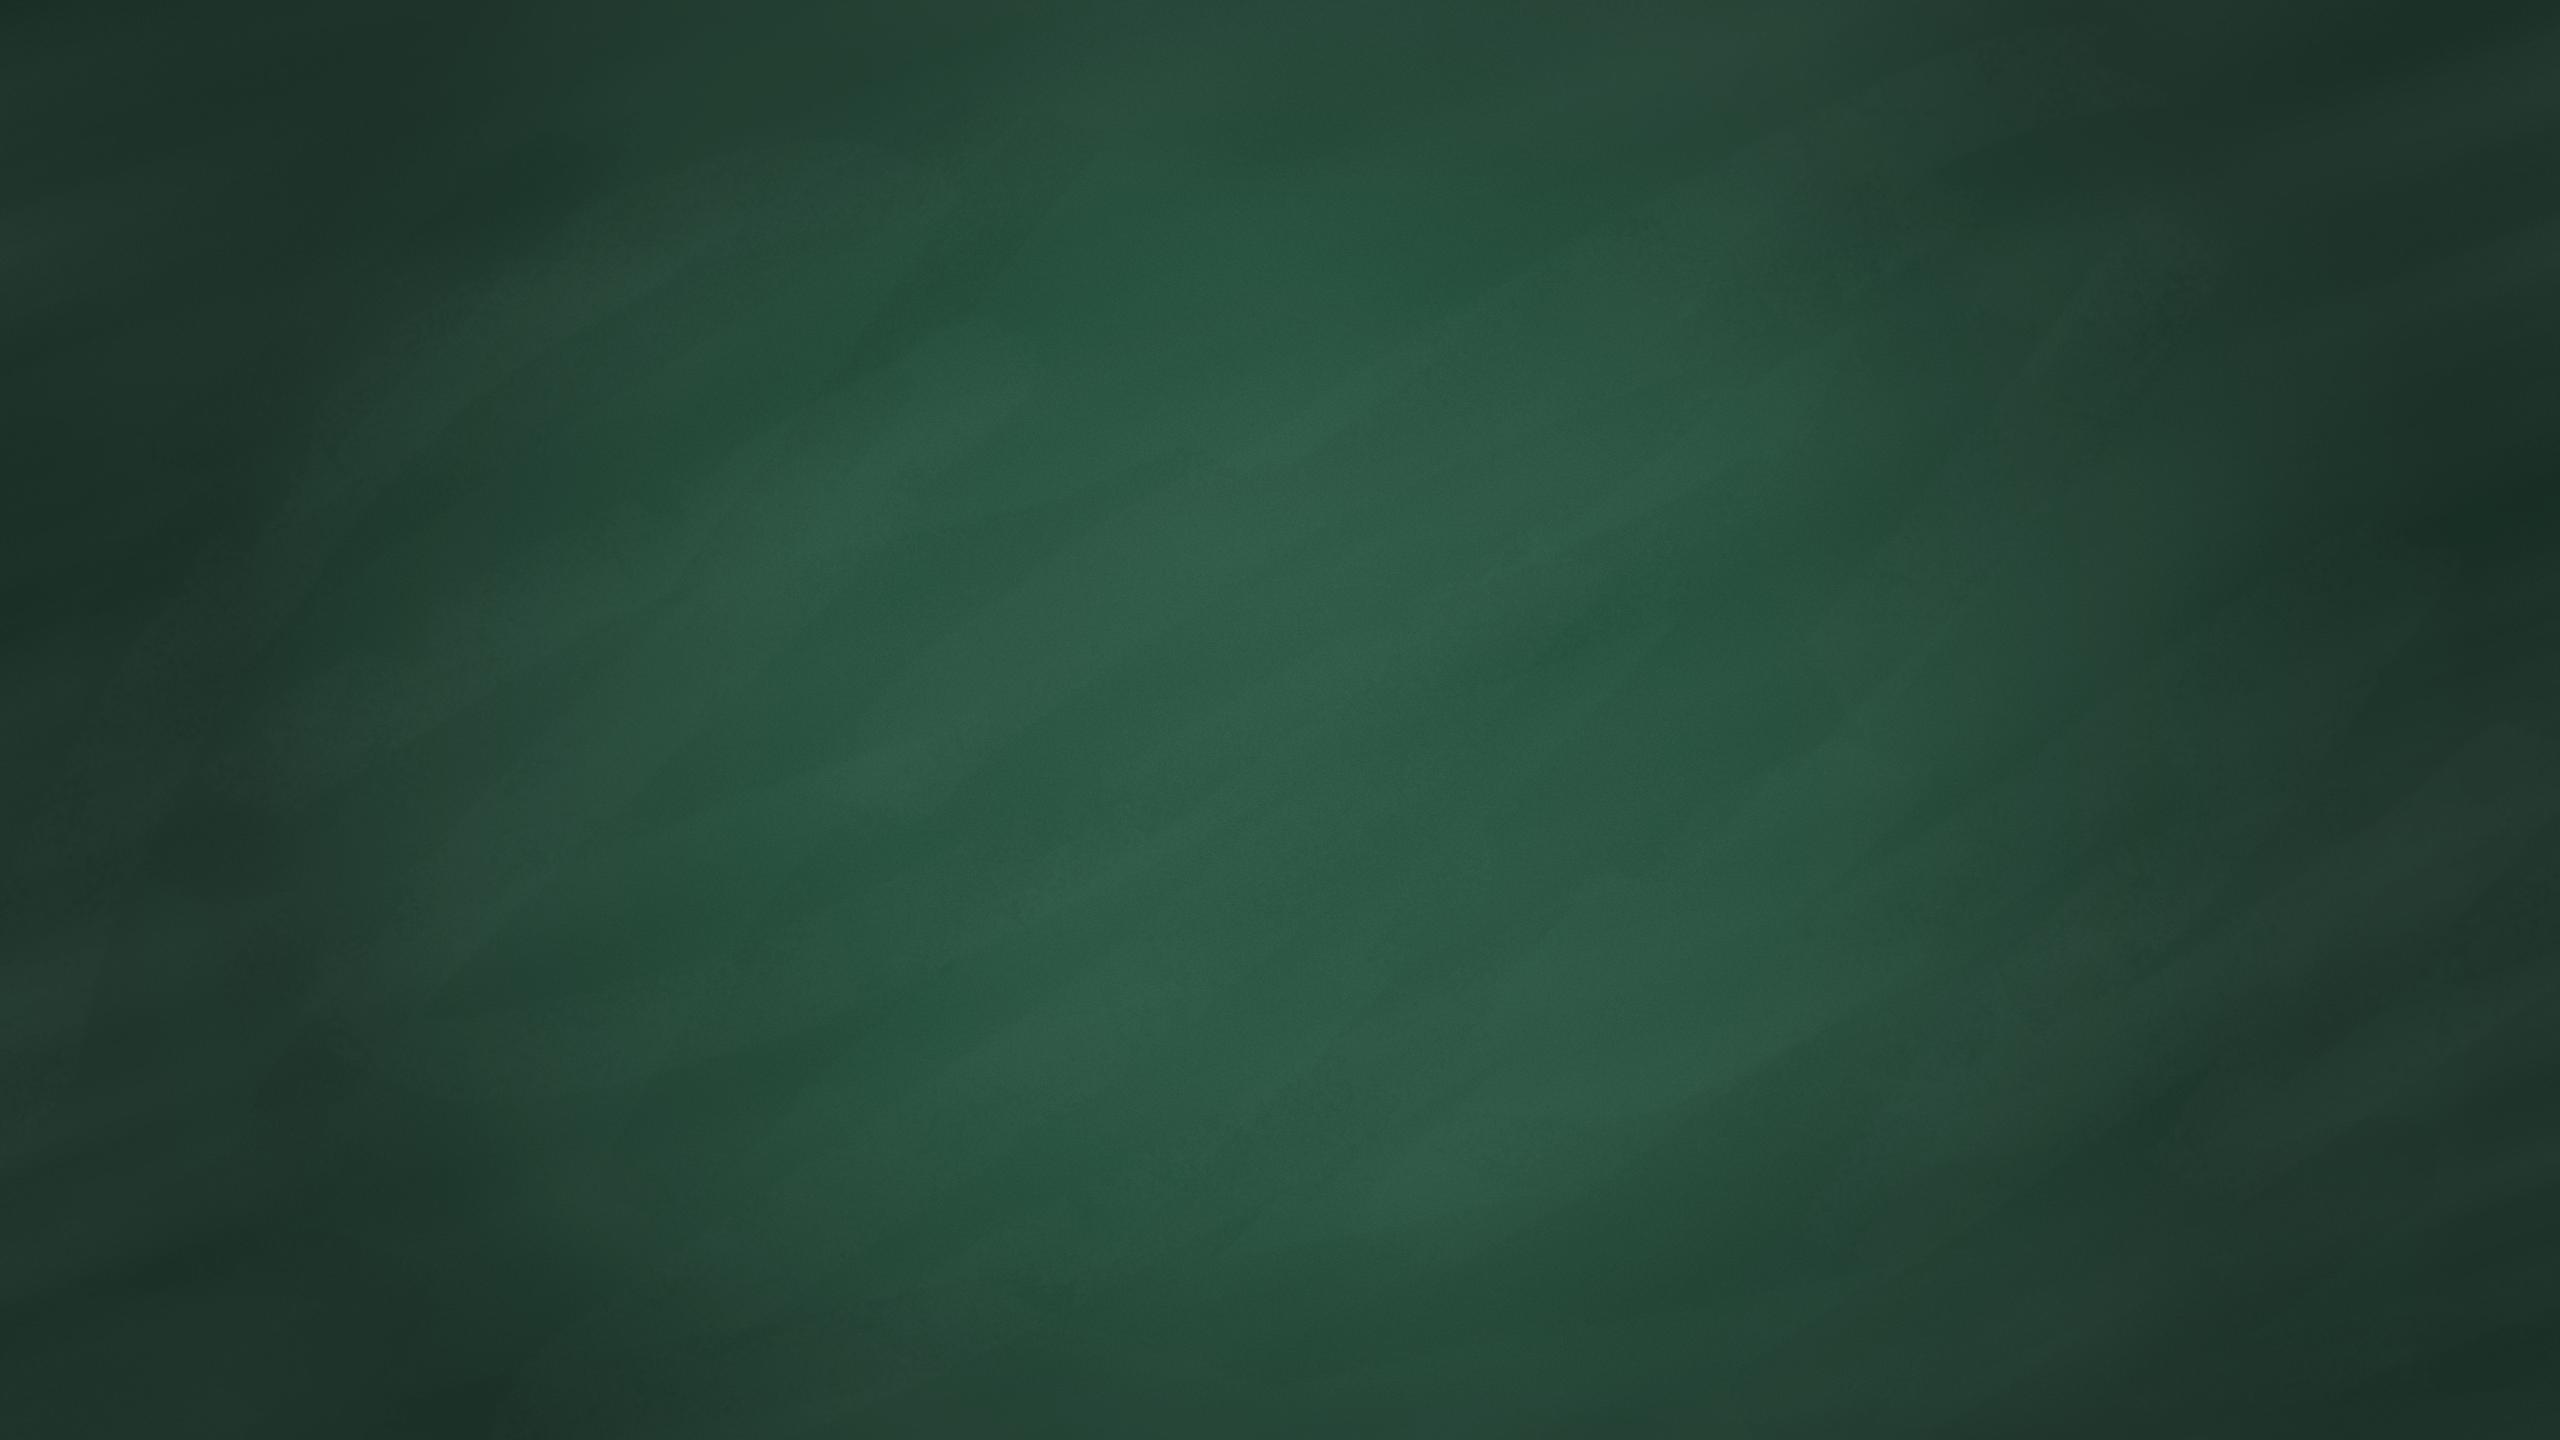 math blackboard background hd - photo #34